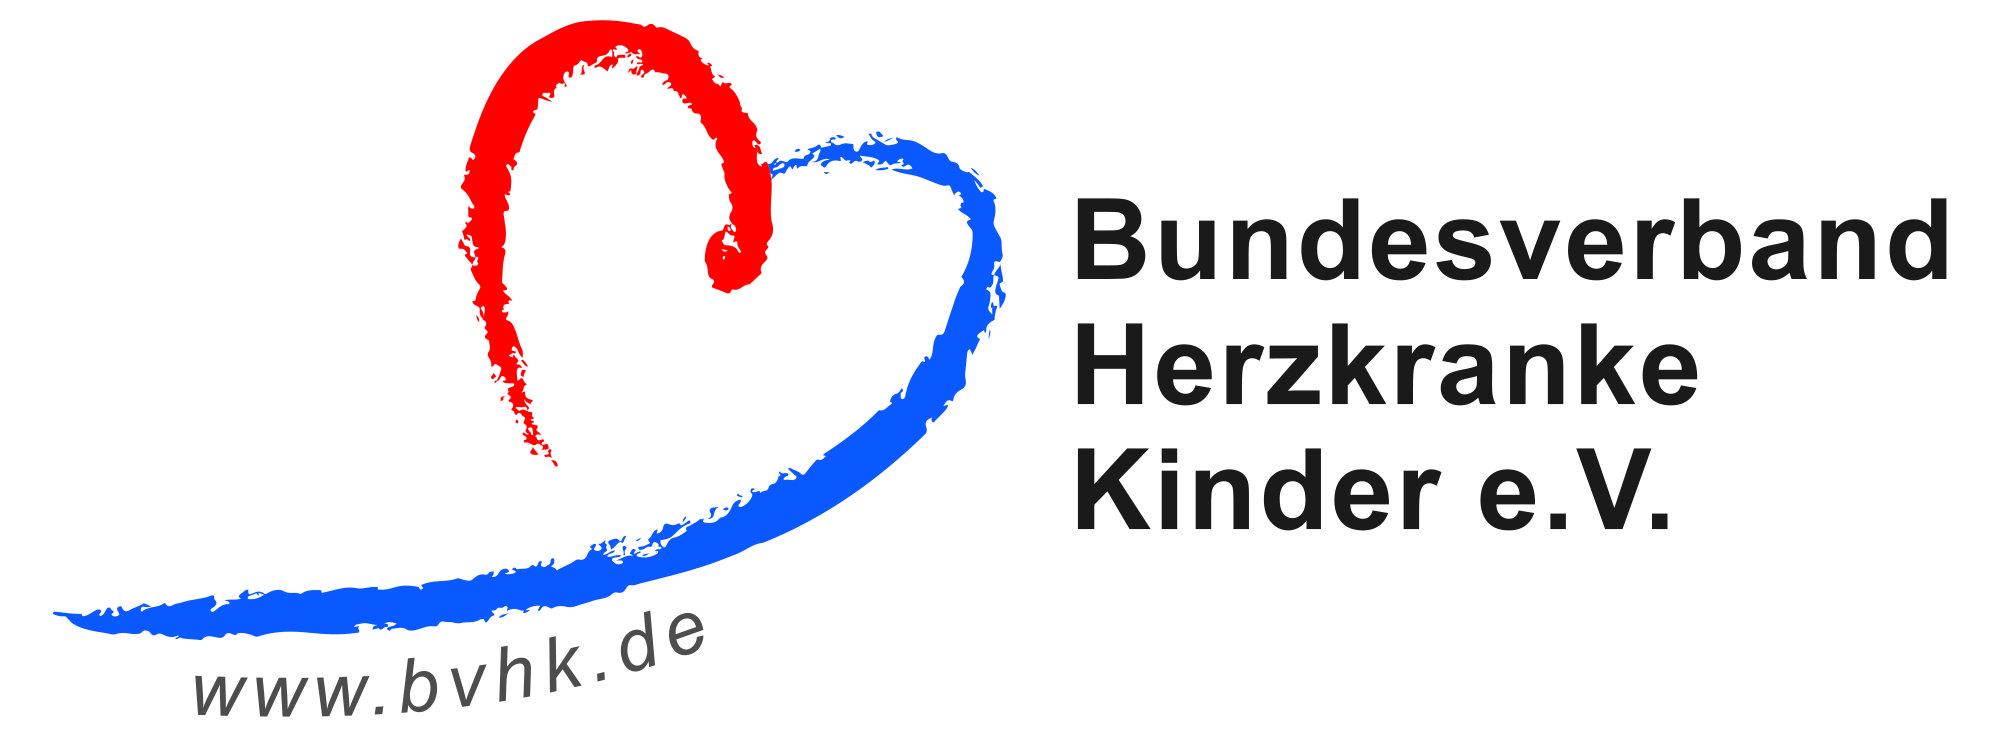 BVHK Logo